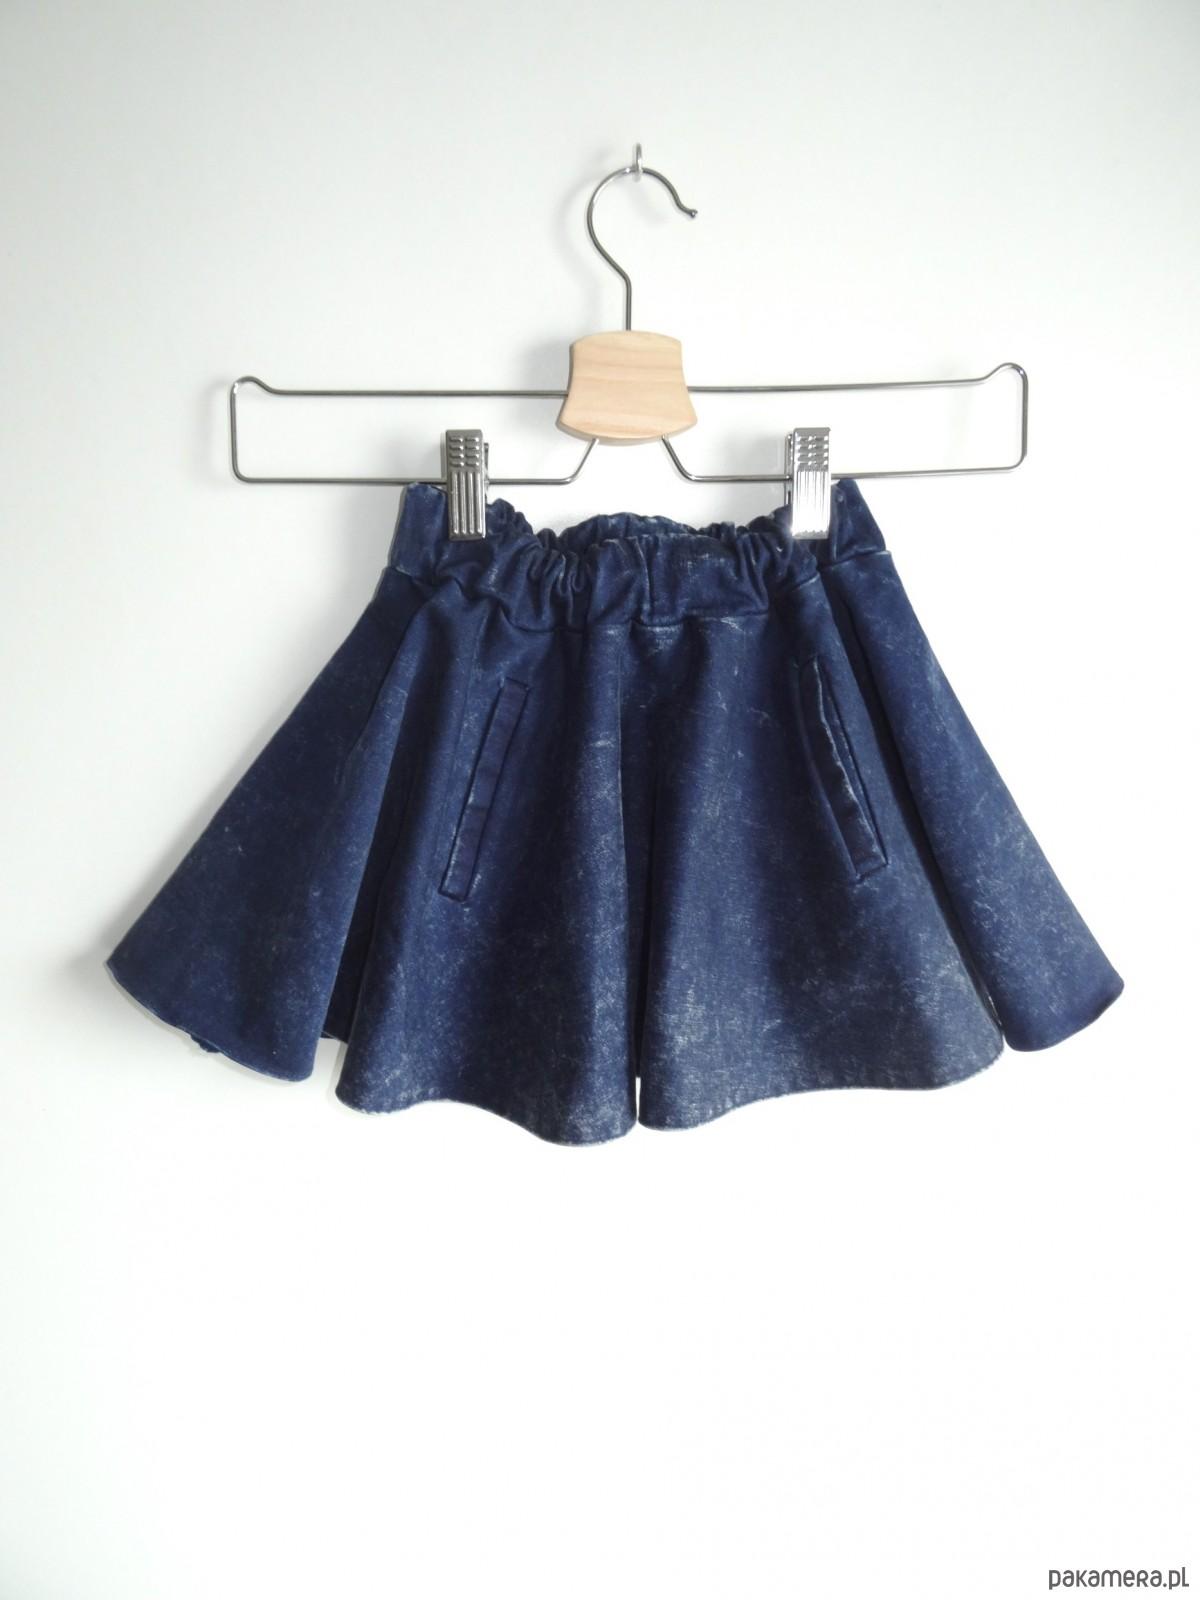 Spódniczka jeansowa niebieska marmurkowa